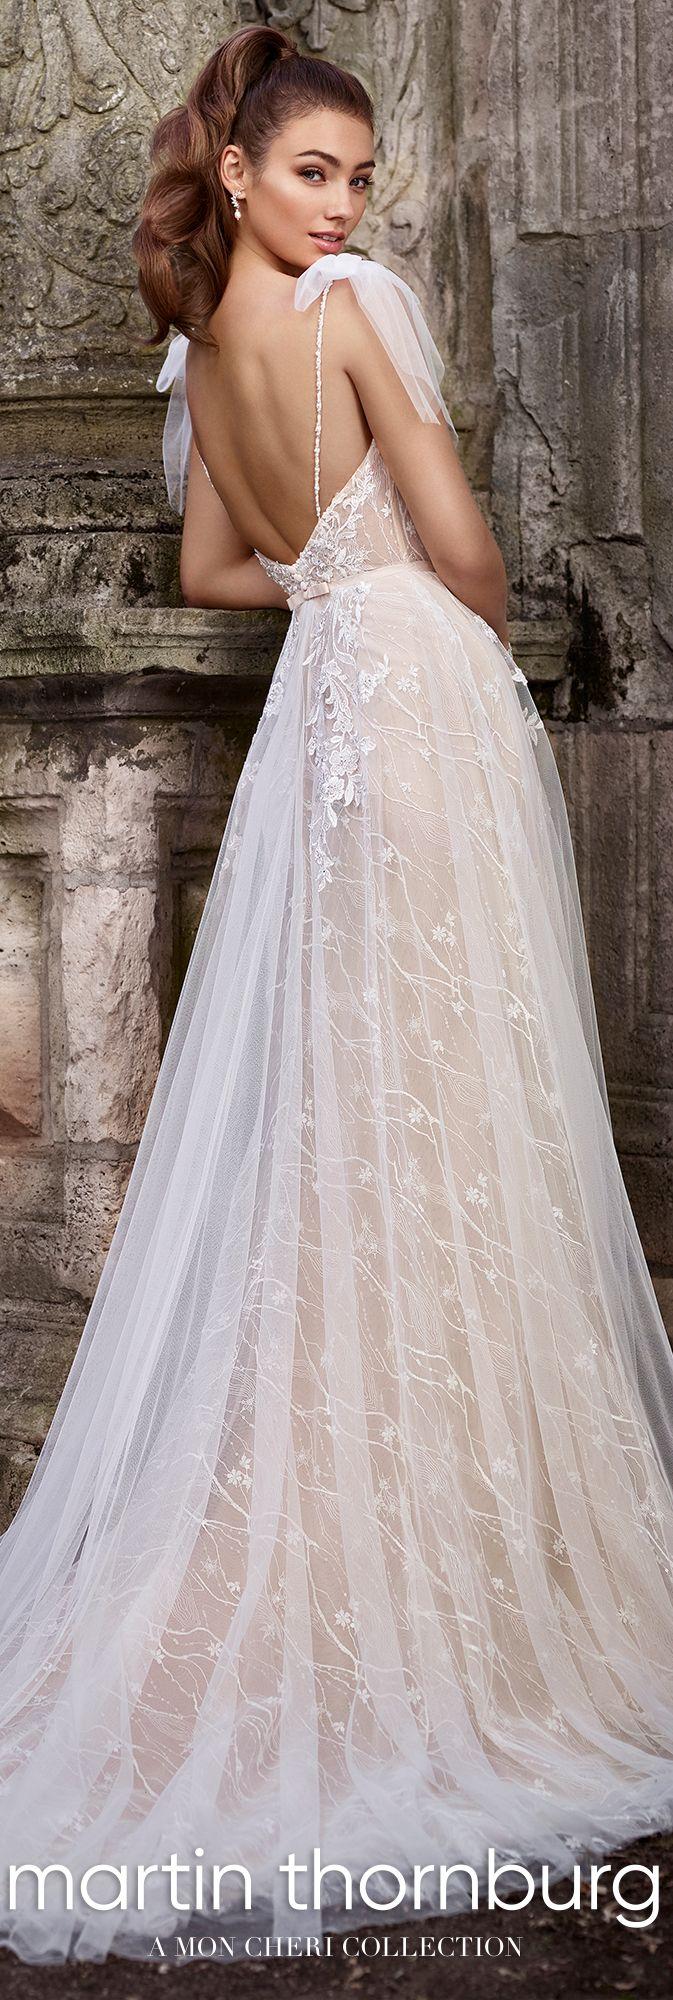 48c7b839cad 119267 Moira - Unique Romantic Wedding Dress - Mon Cheri in 2019 ...